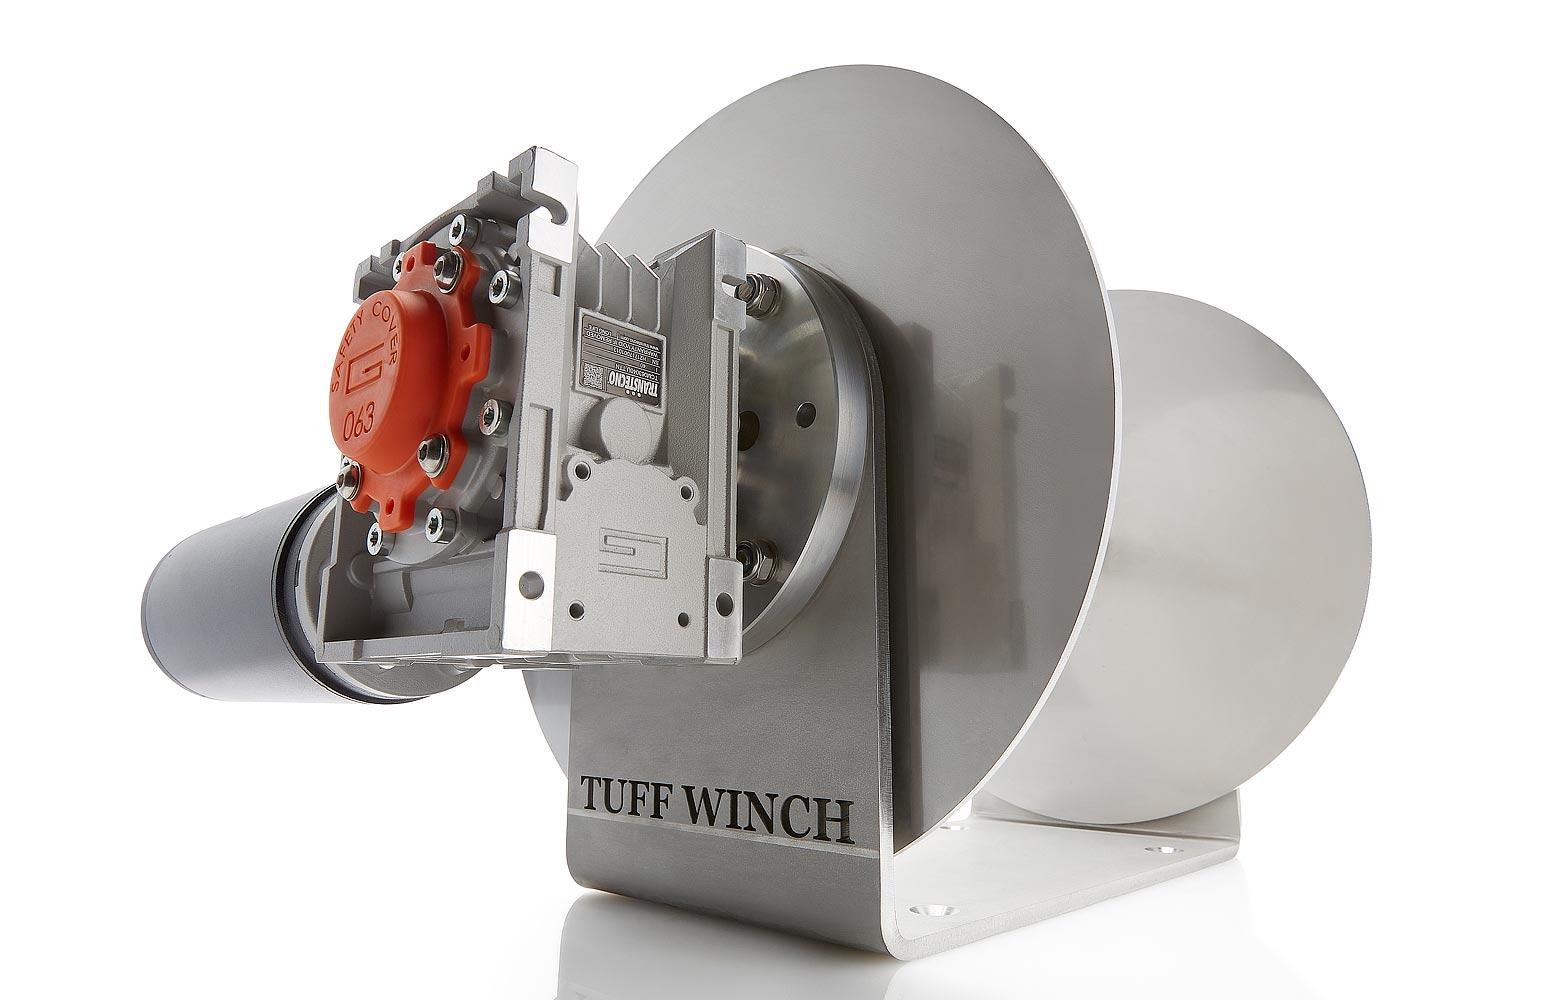 tuff-winch-product-photography-1.jpg